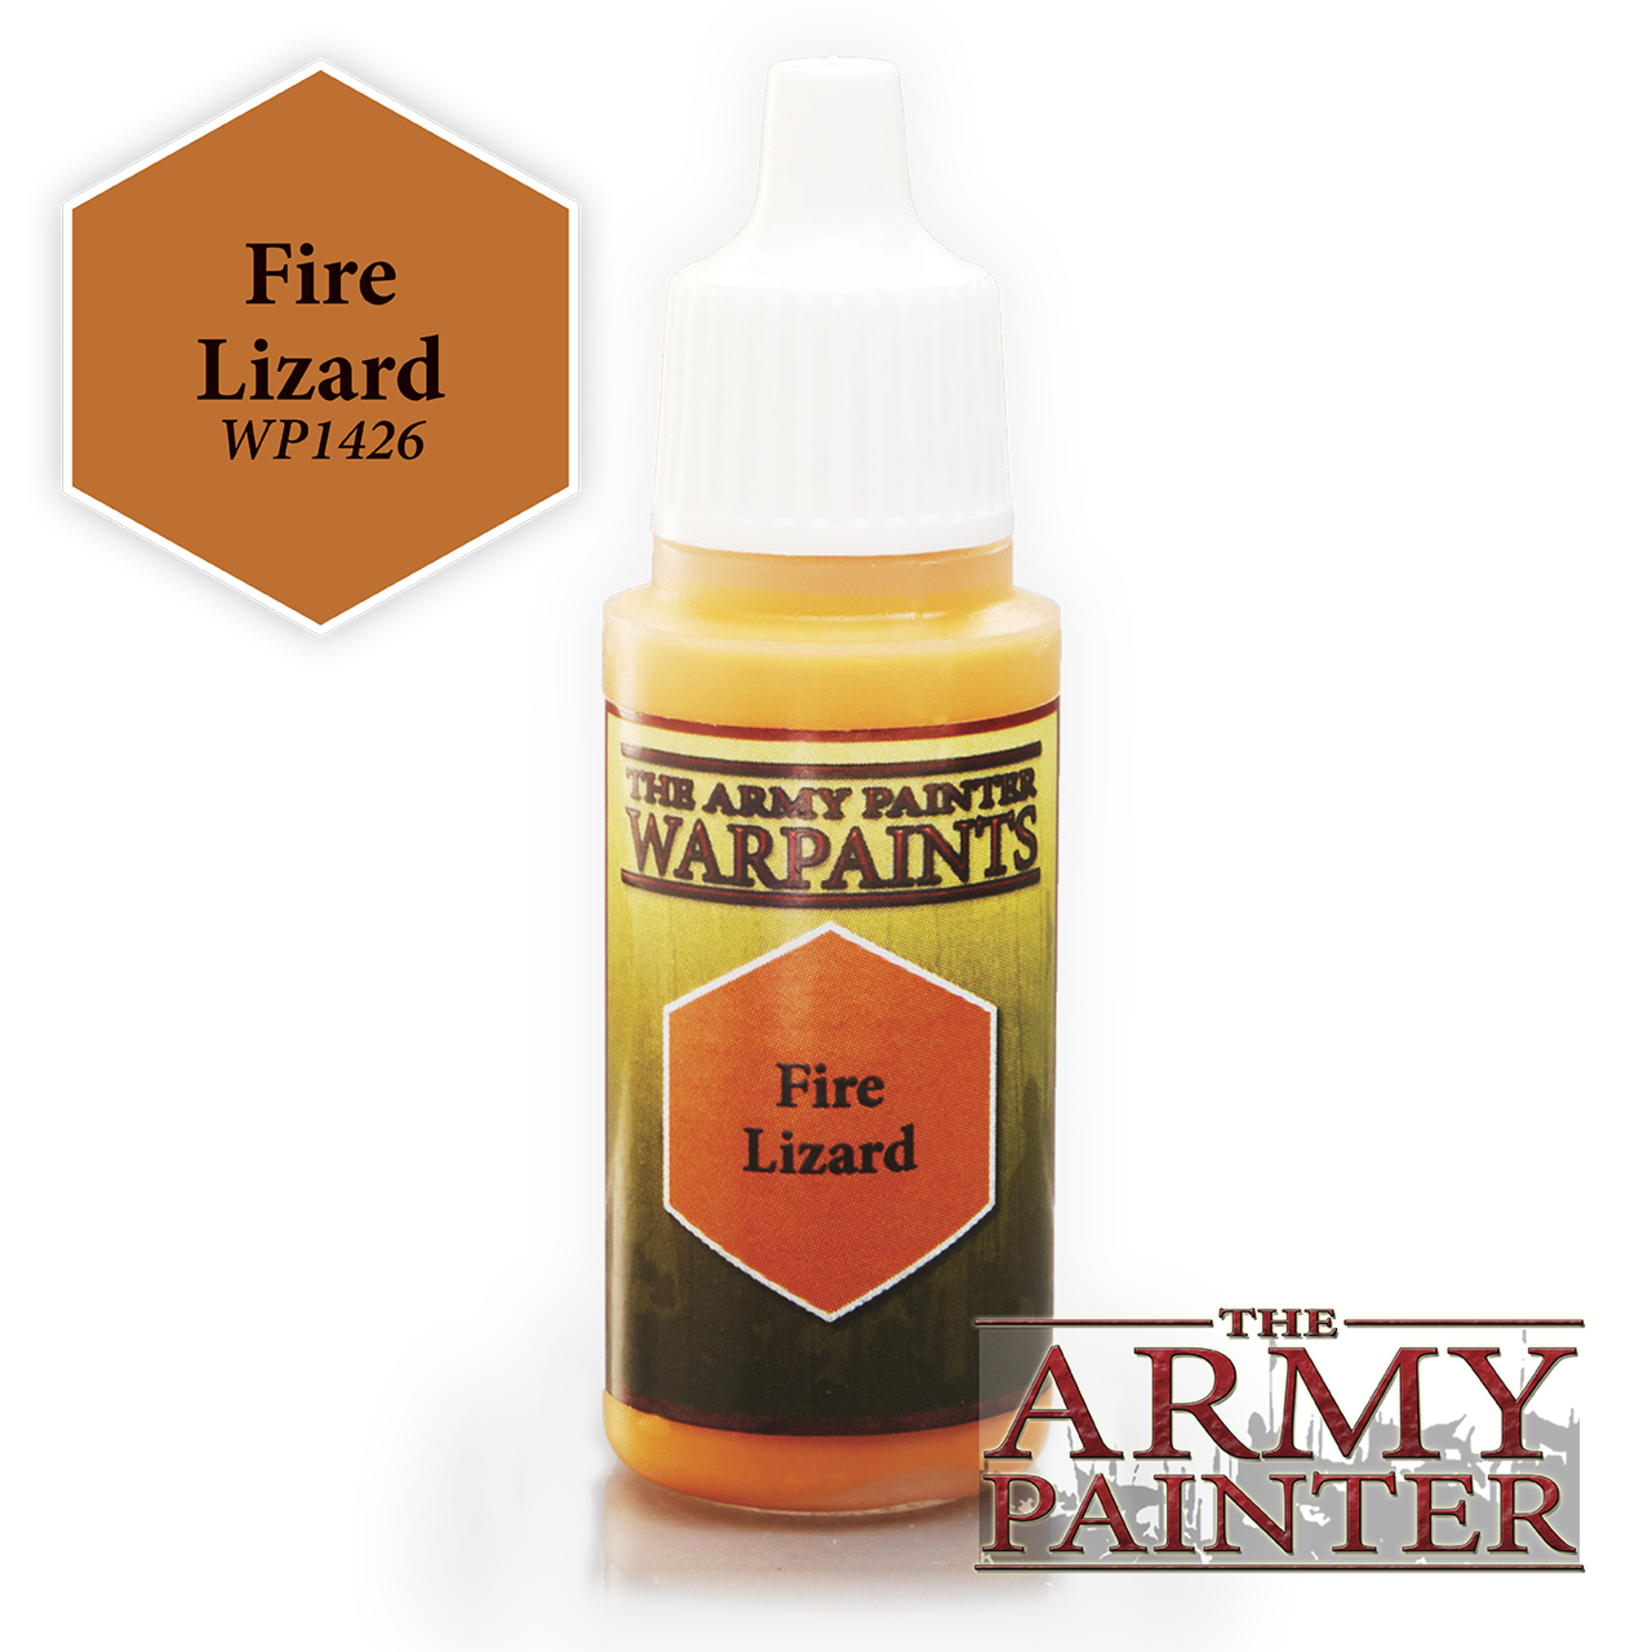 Army Painter Army Painter Warpaint Fire Lizard 18ml